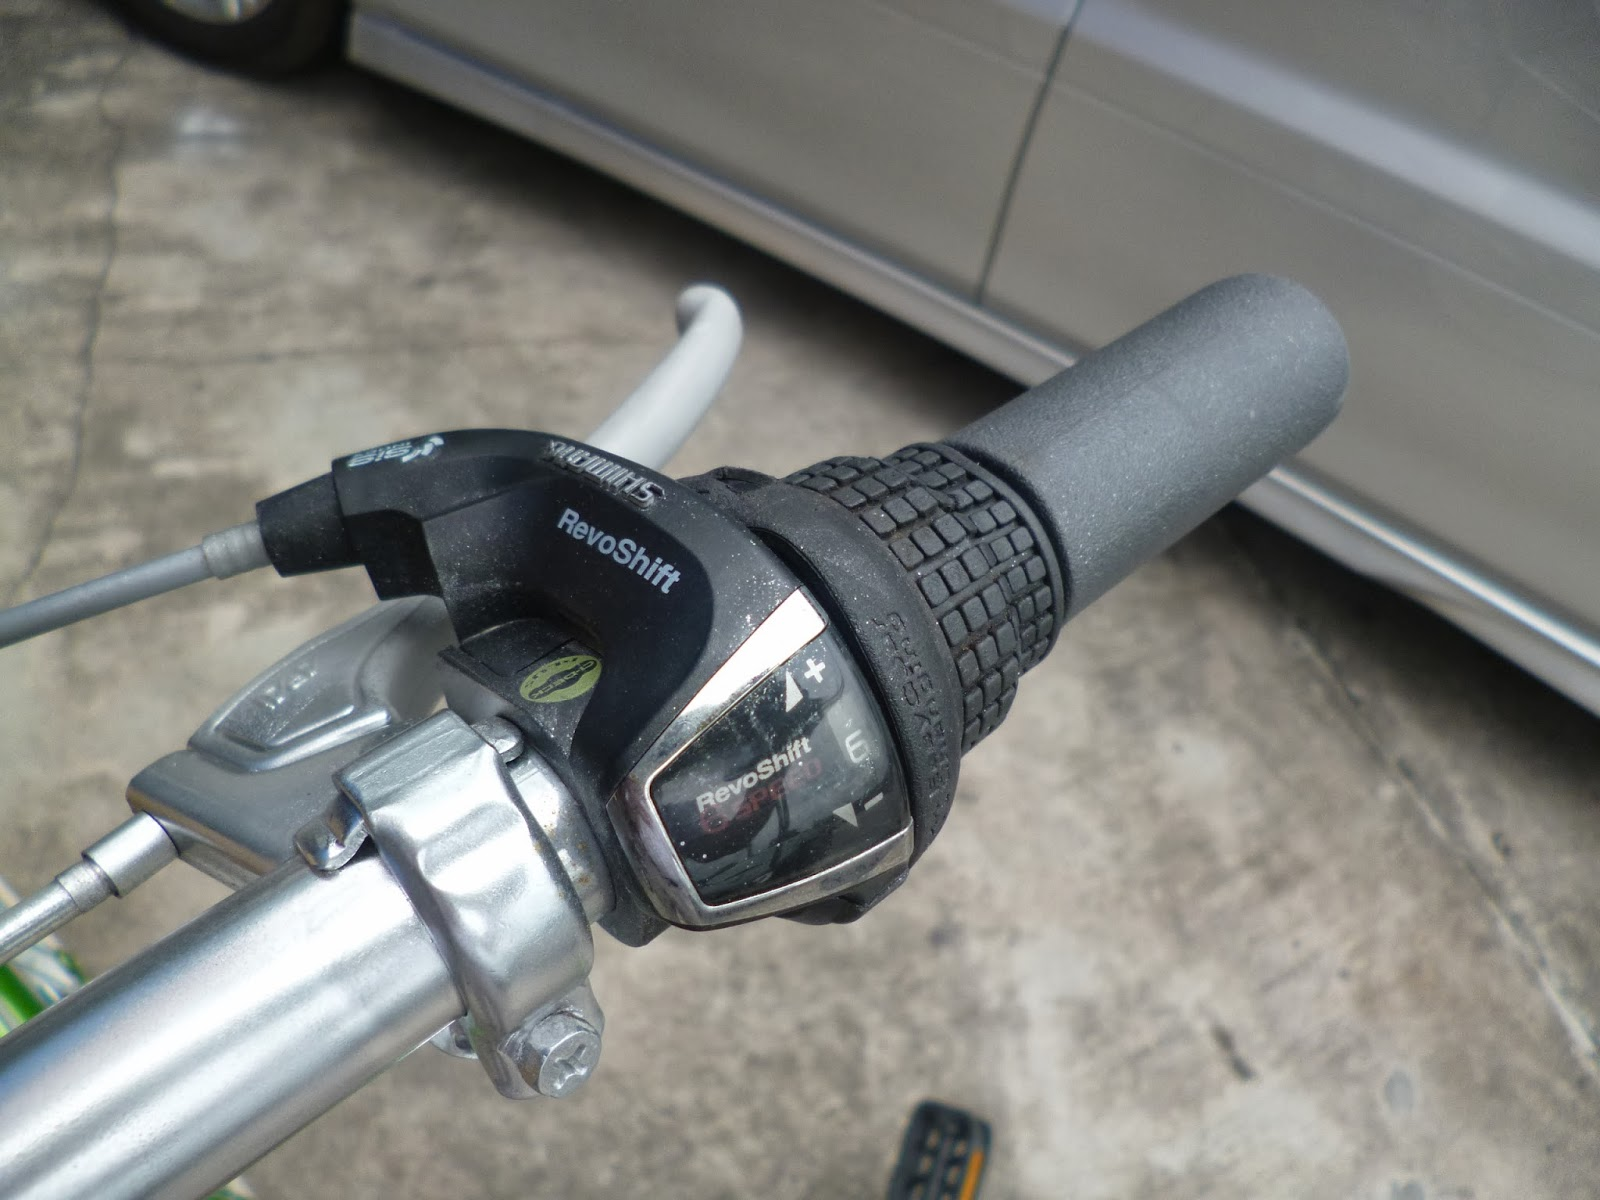 shimano revoshift 6 speed manual